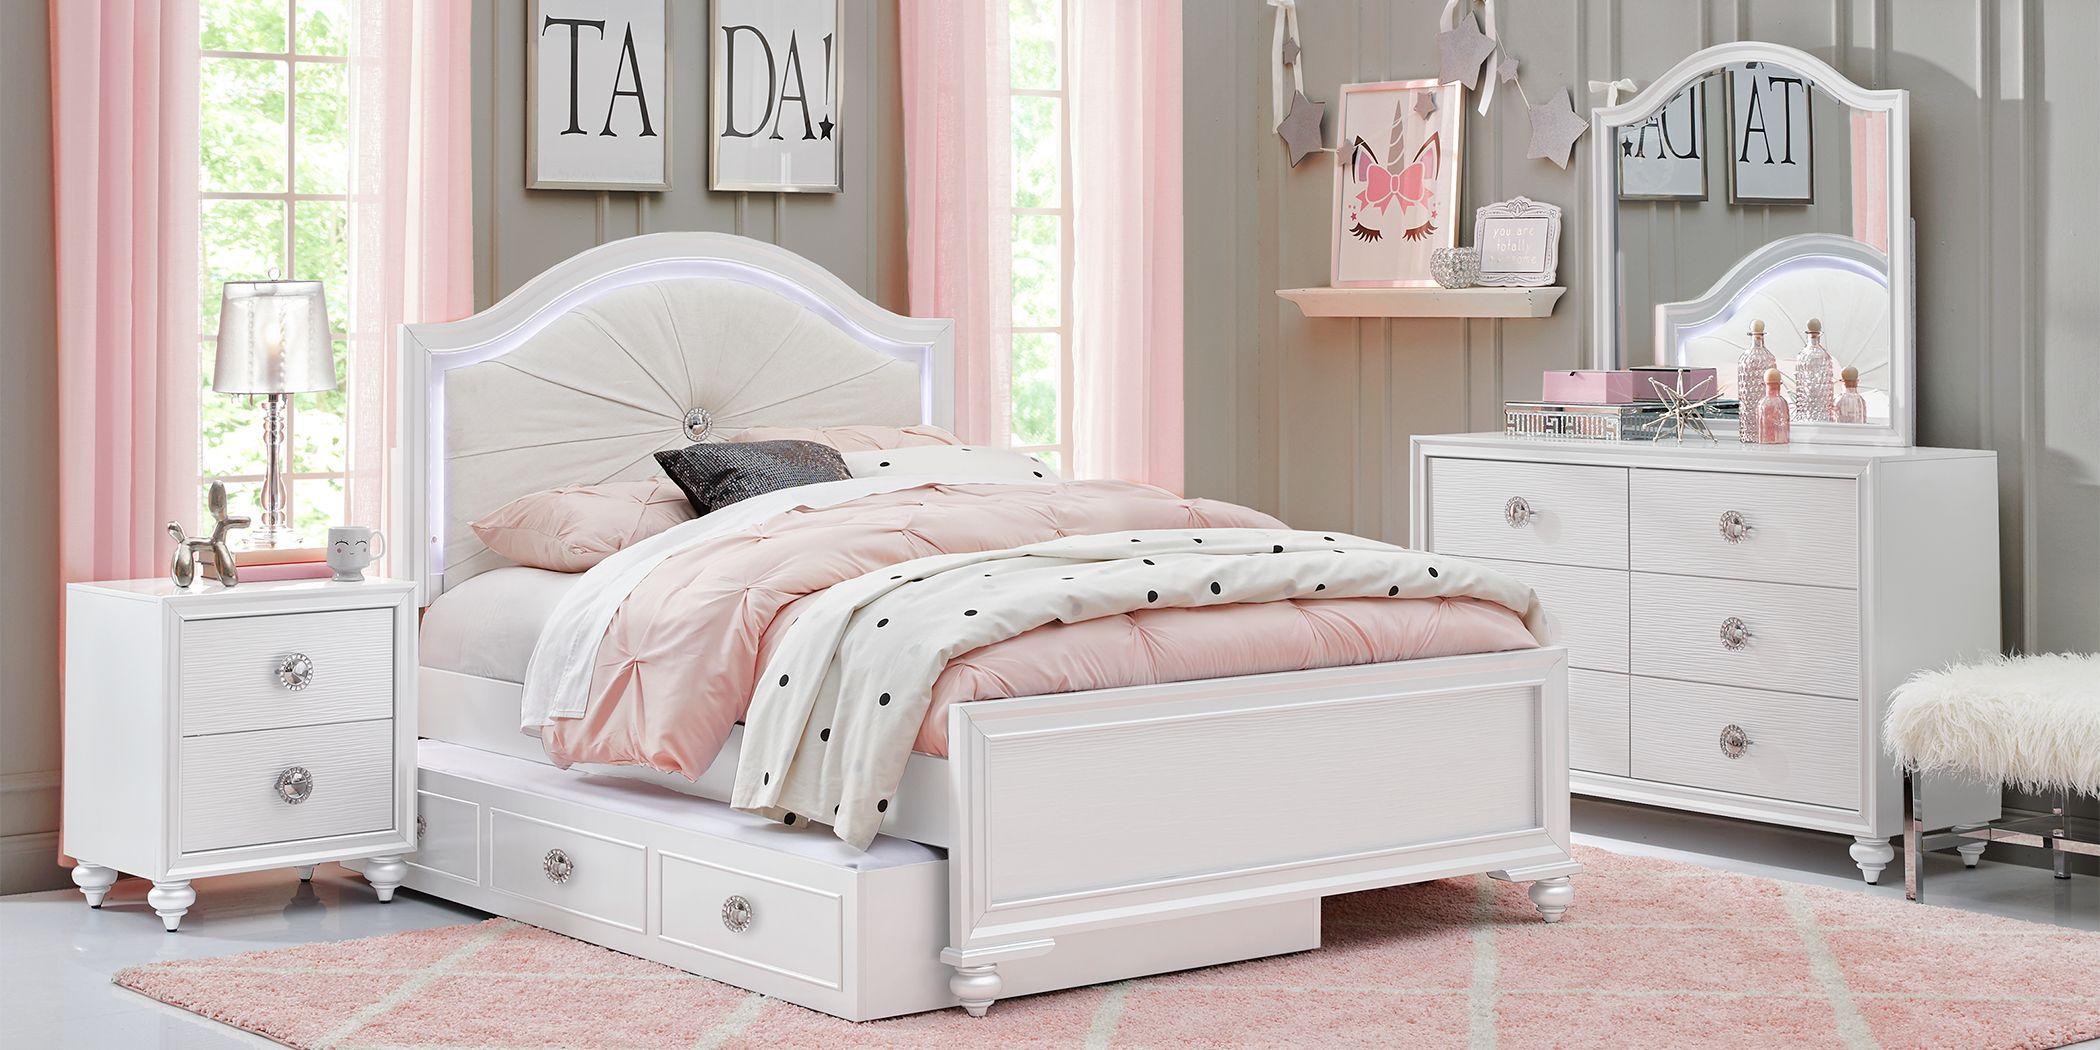 Kids Evangeline White 5 Pc Twin Lighted Upholstered Bedroom